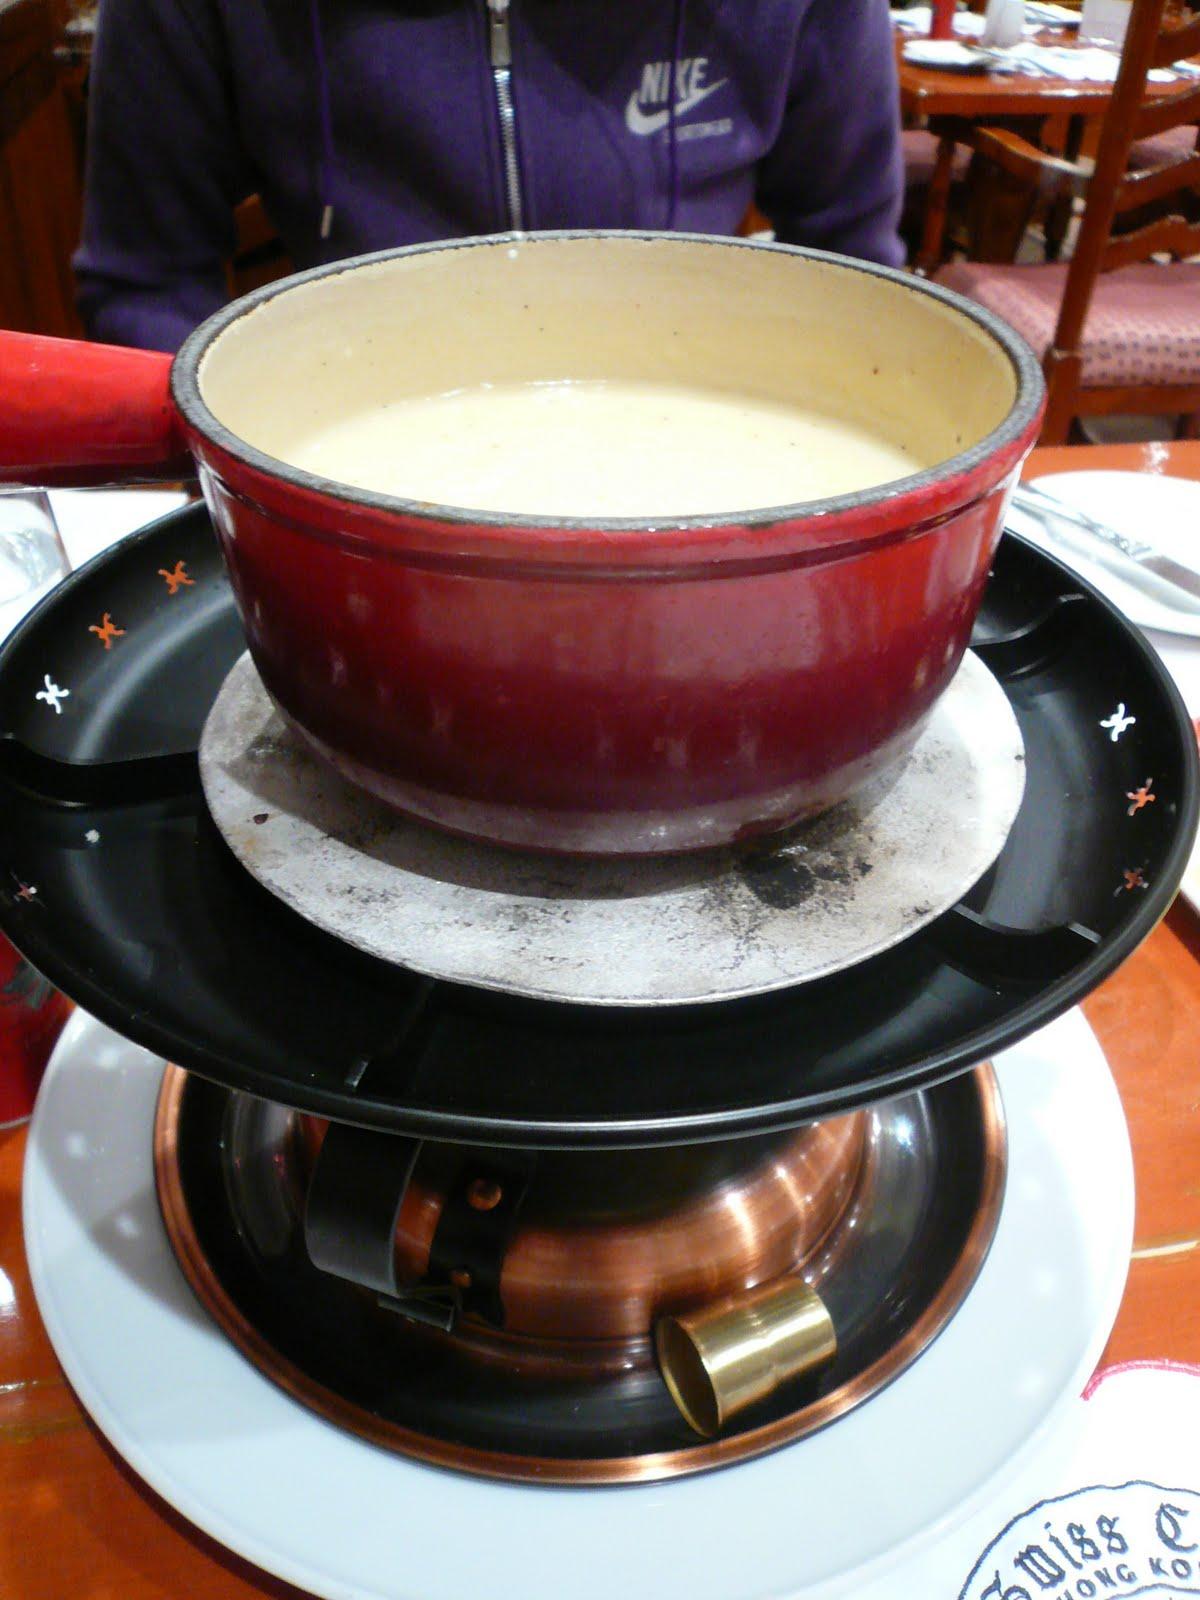 Fabrice 嚐味: 瑞士餐廳 - 芝士火鍋慶聖誕